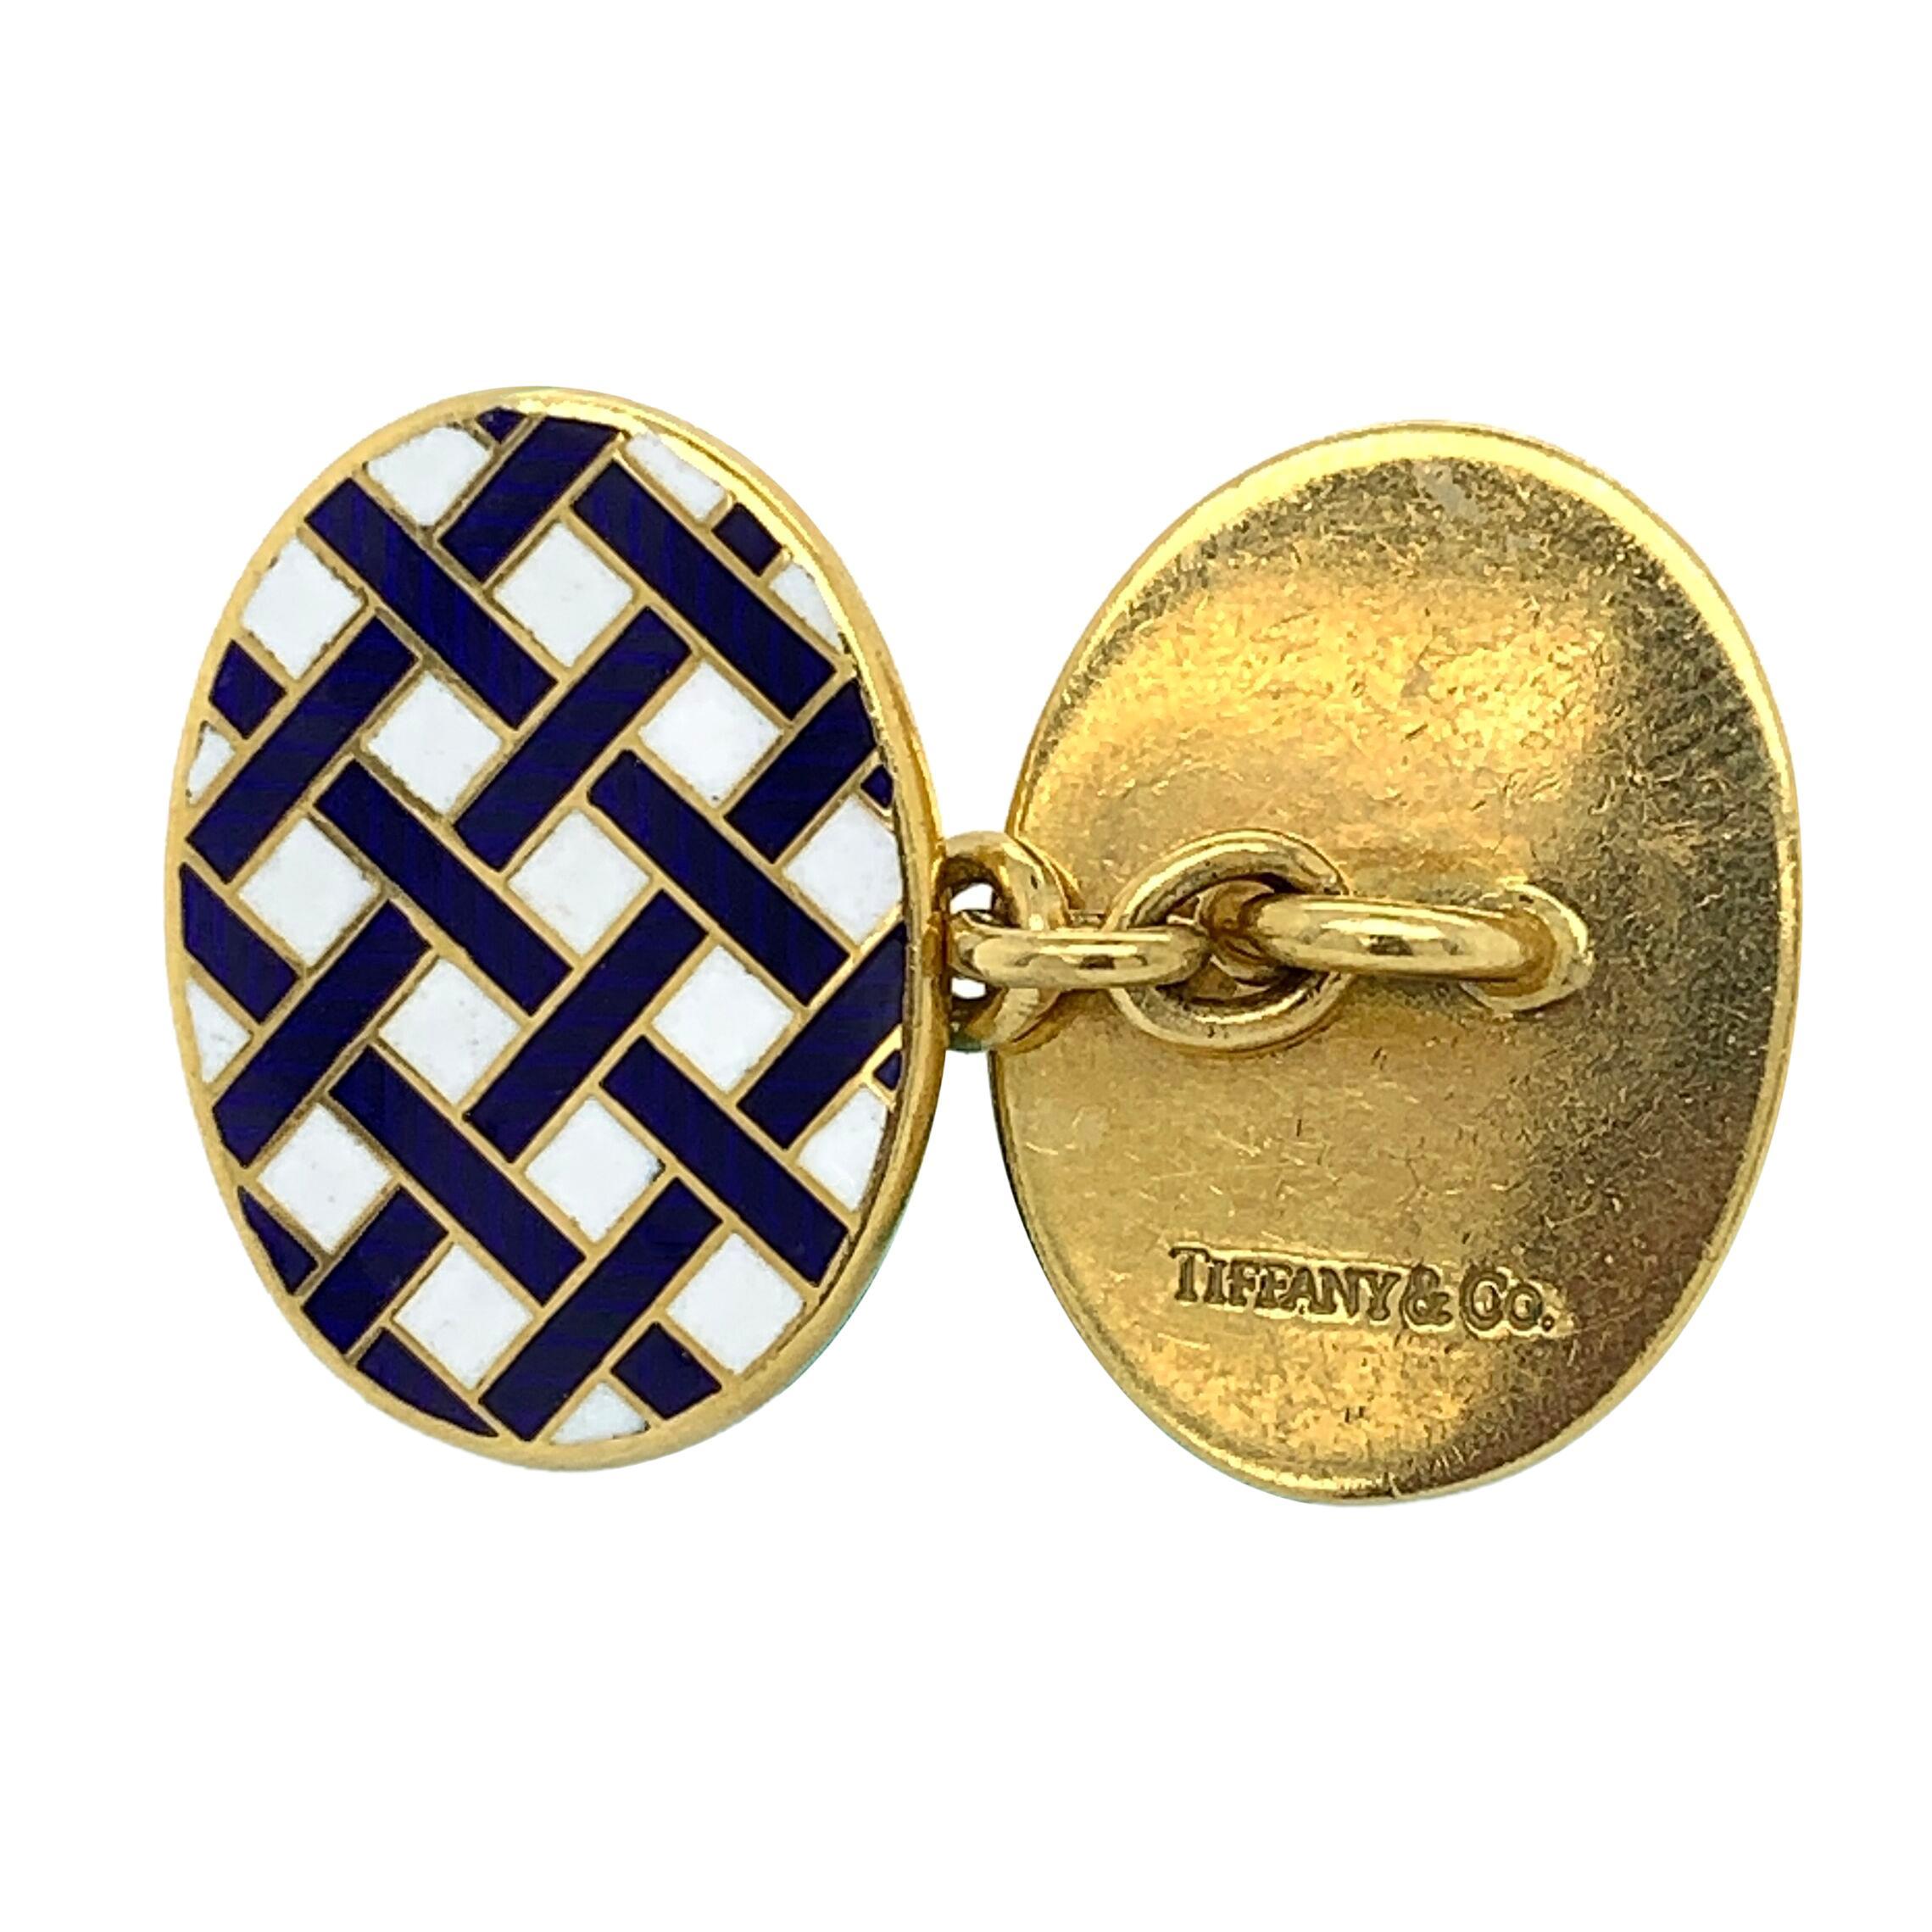 Tiffany & Co 18 Karat Yellow Gold Enamel Cufflinks